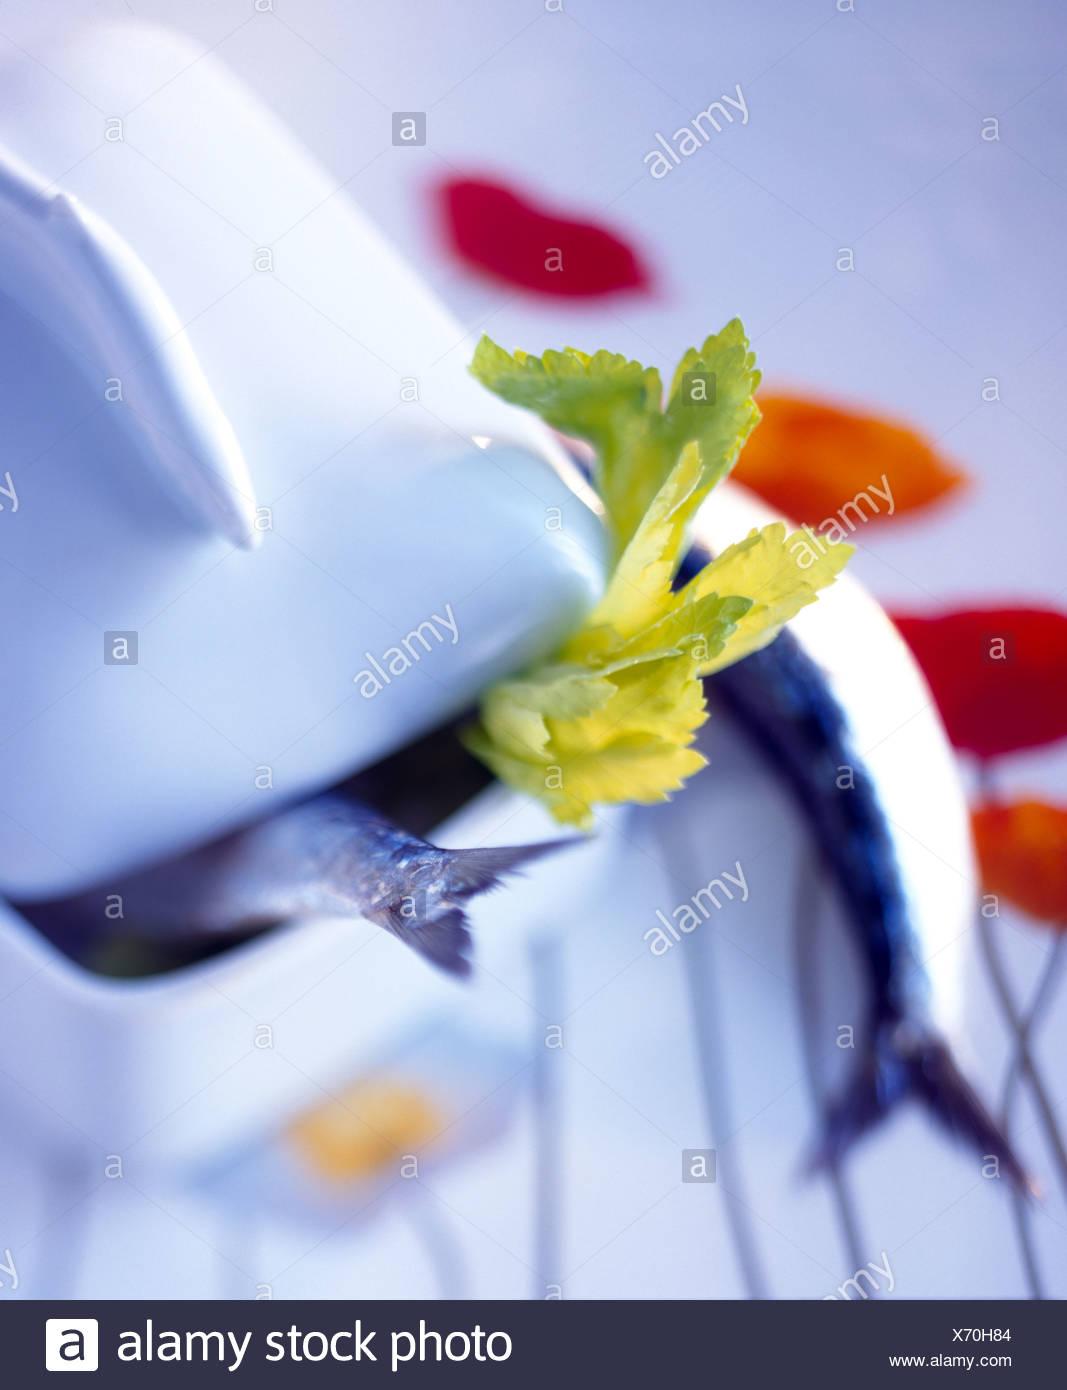 Fish tails in terrine dish - Stock Image